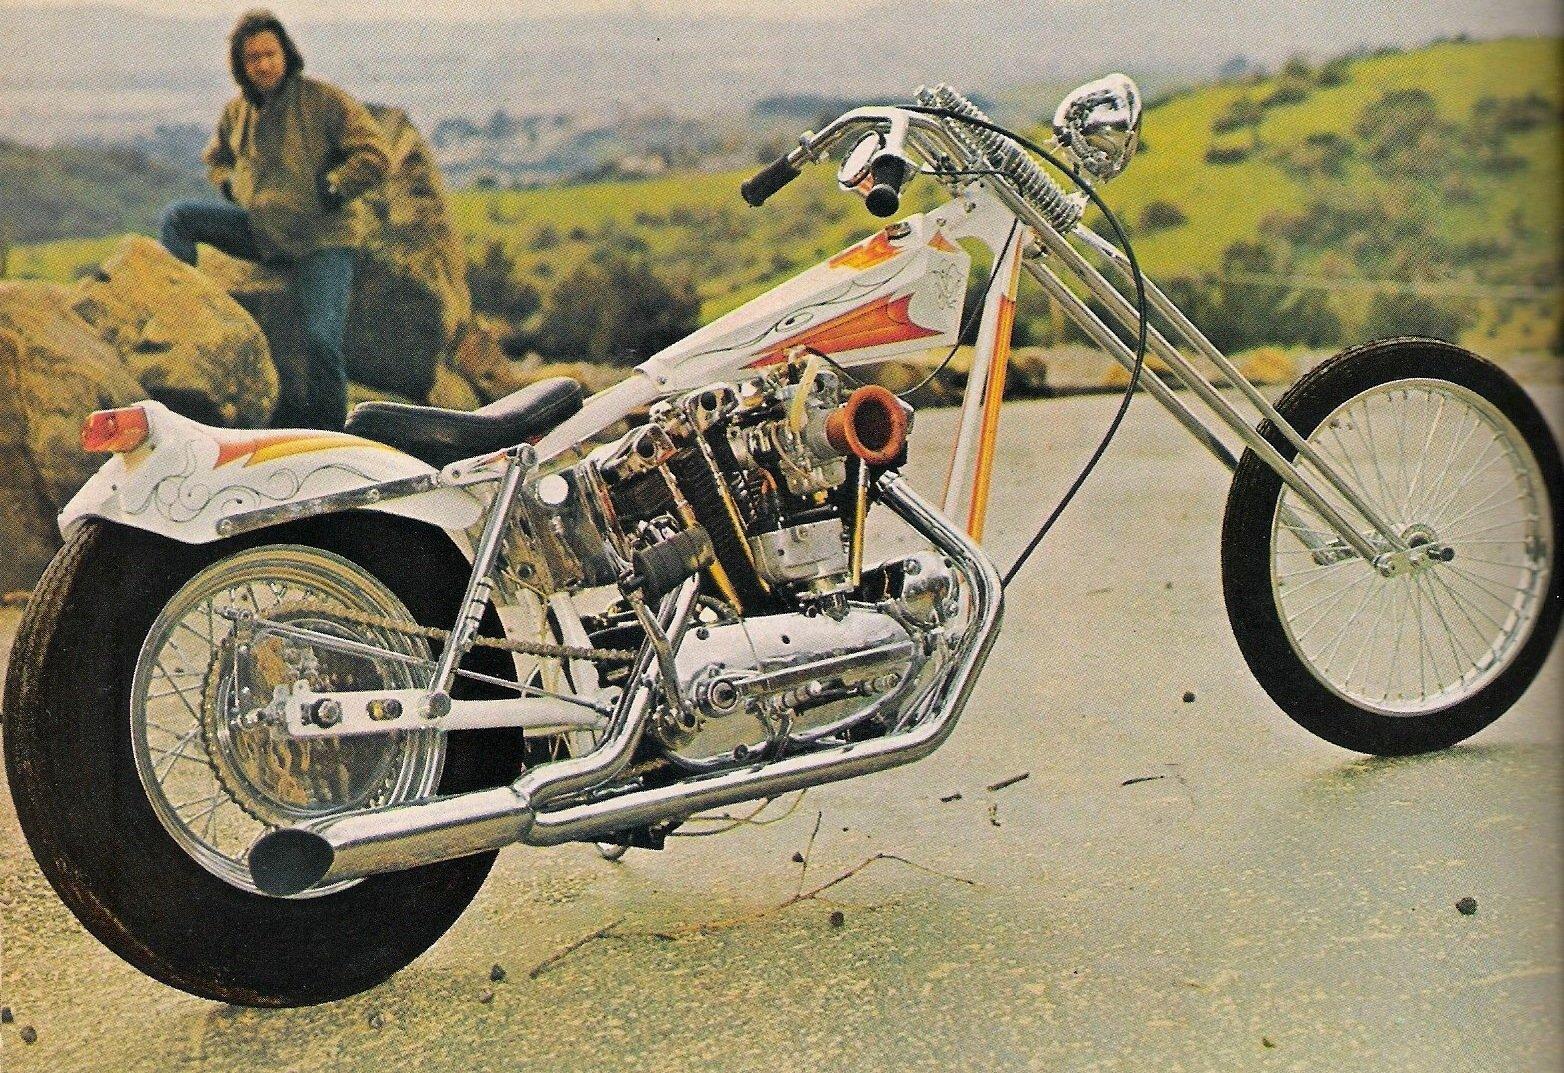 1970s-arlen-ness